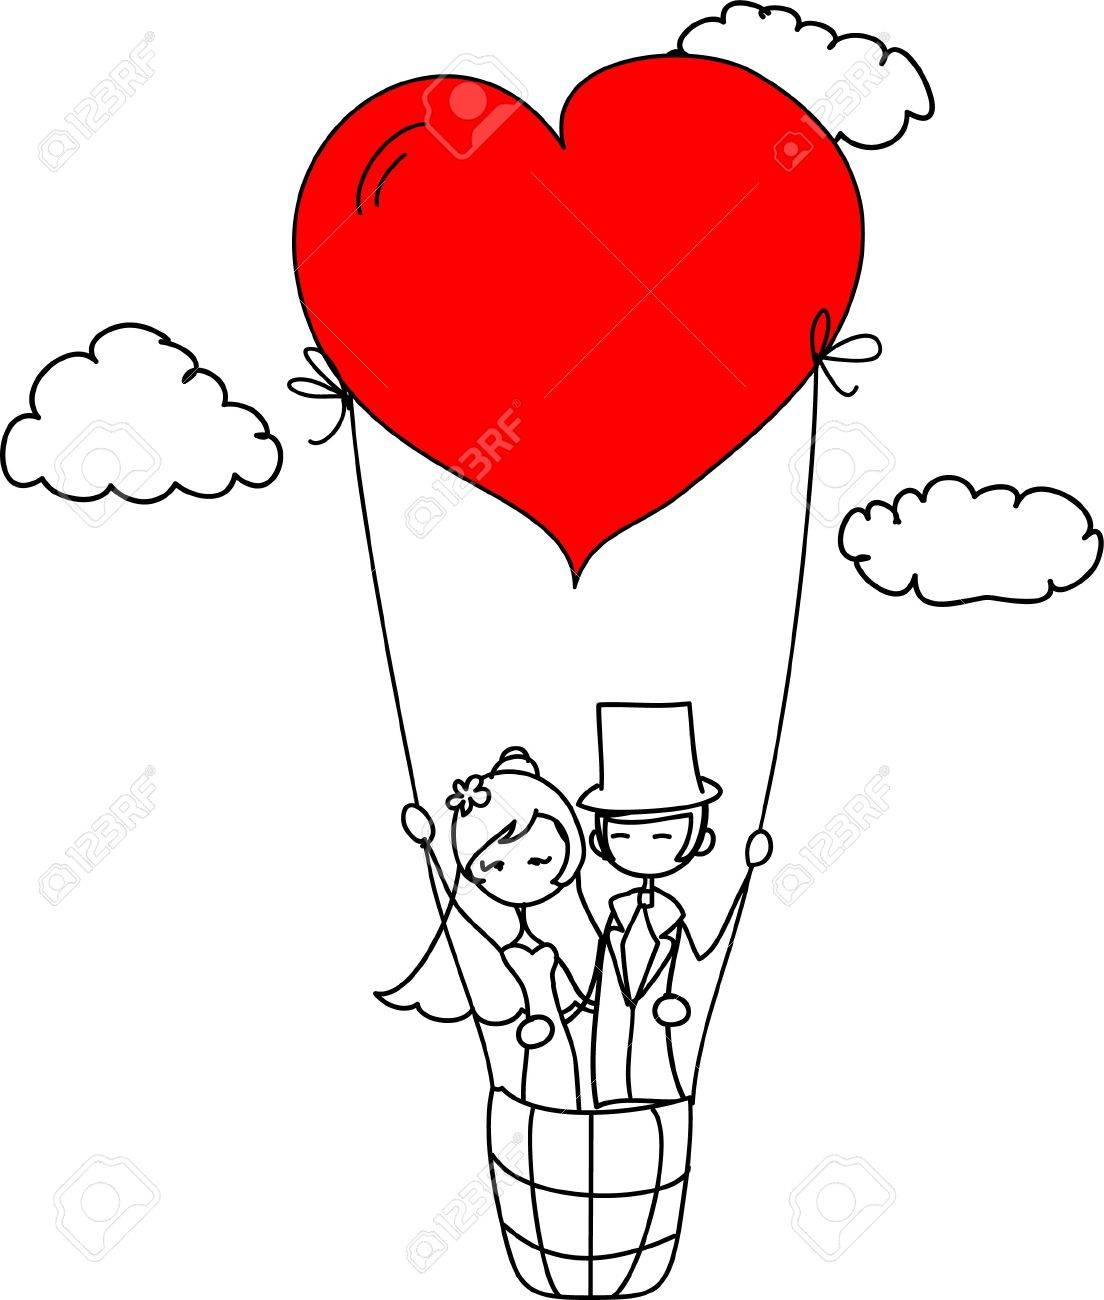 wedding picture Stock Vector - 11657418